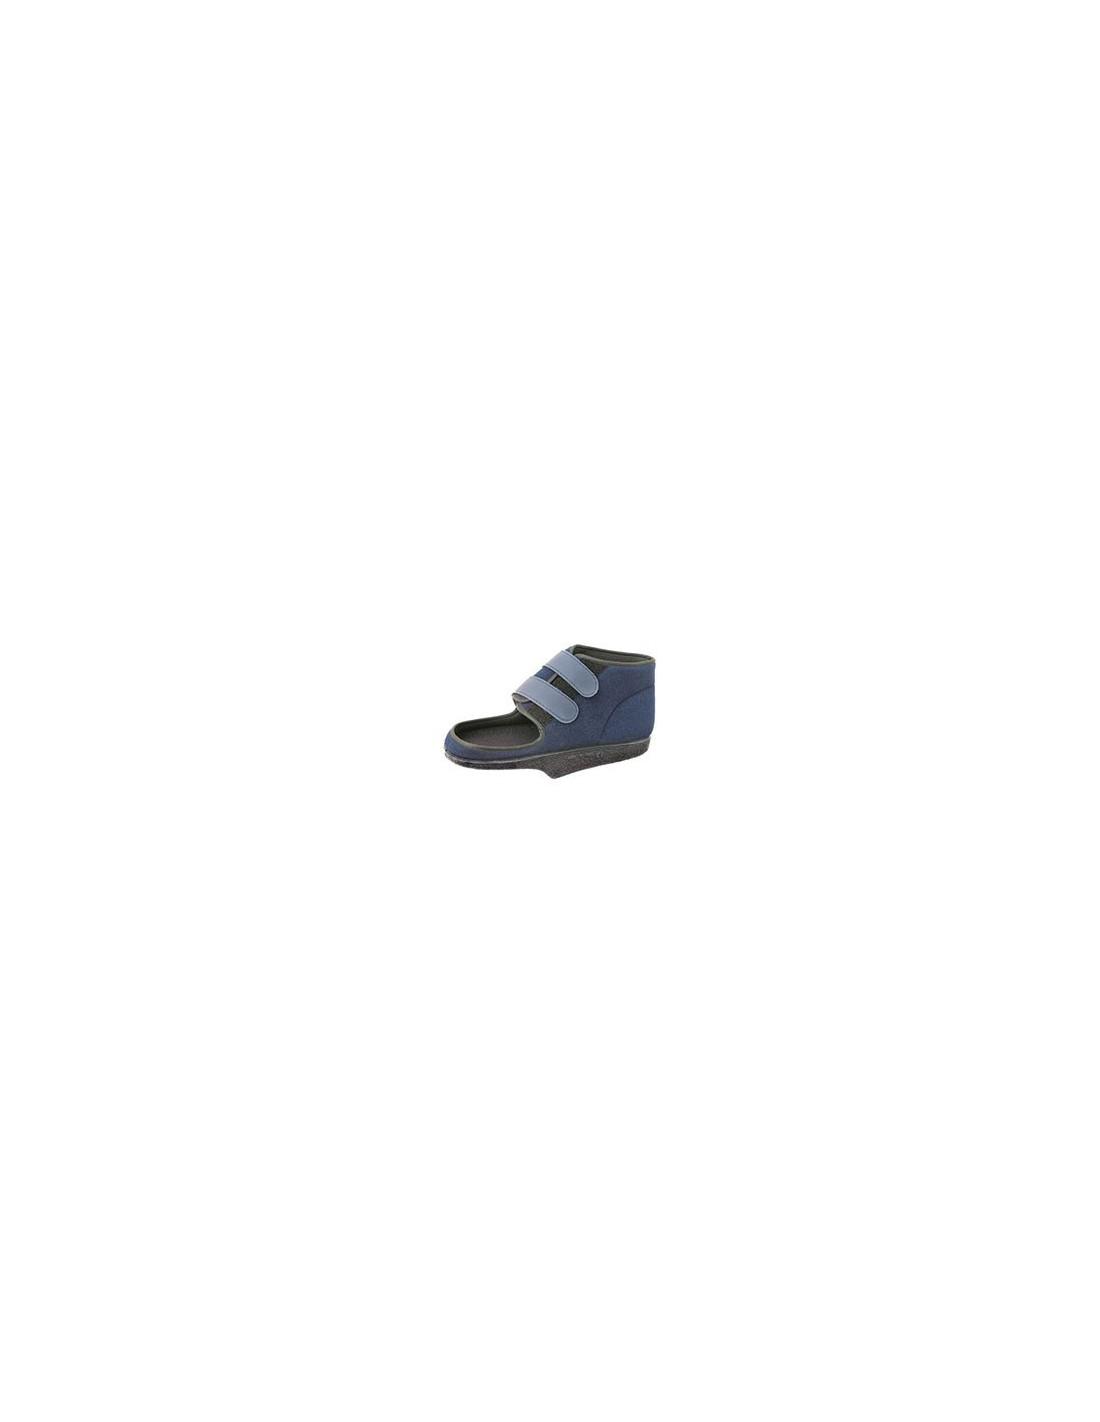 online store 2841d eeaf4 Scarpa di Baruk ambidestro Piumaped 8 Wimed